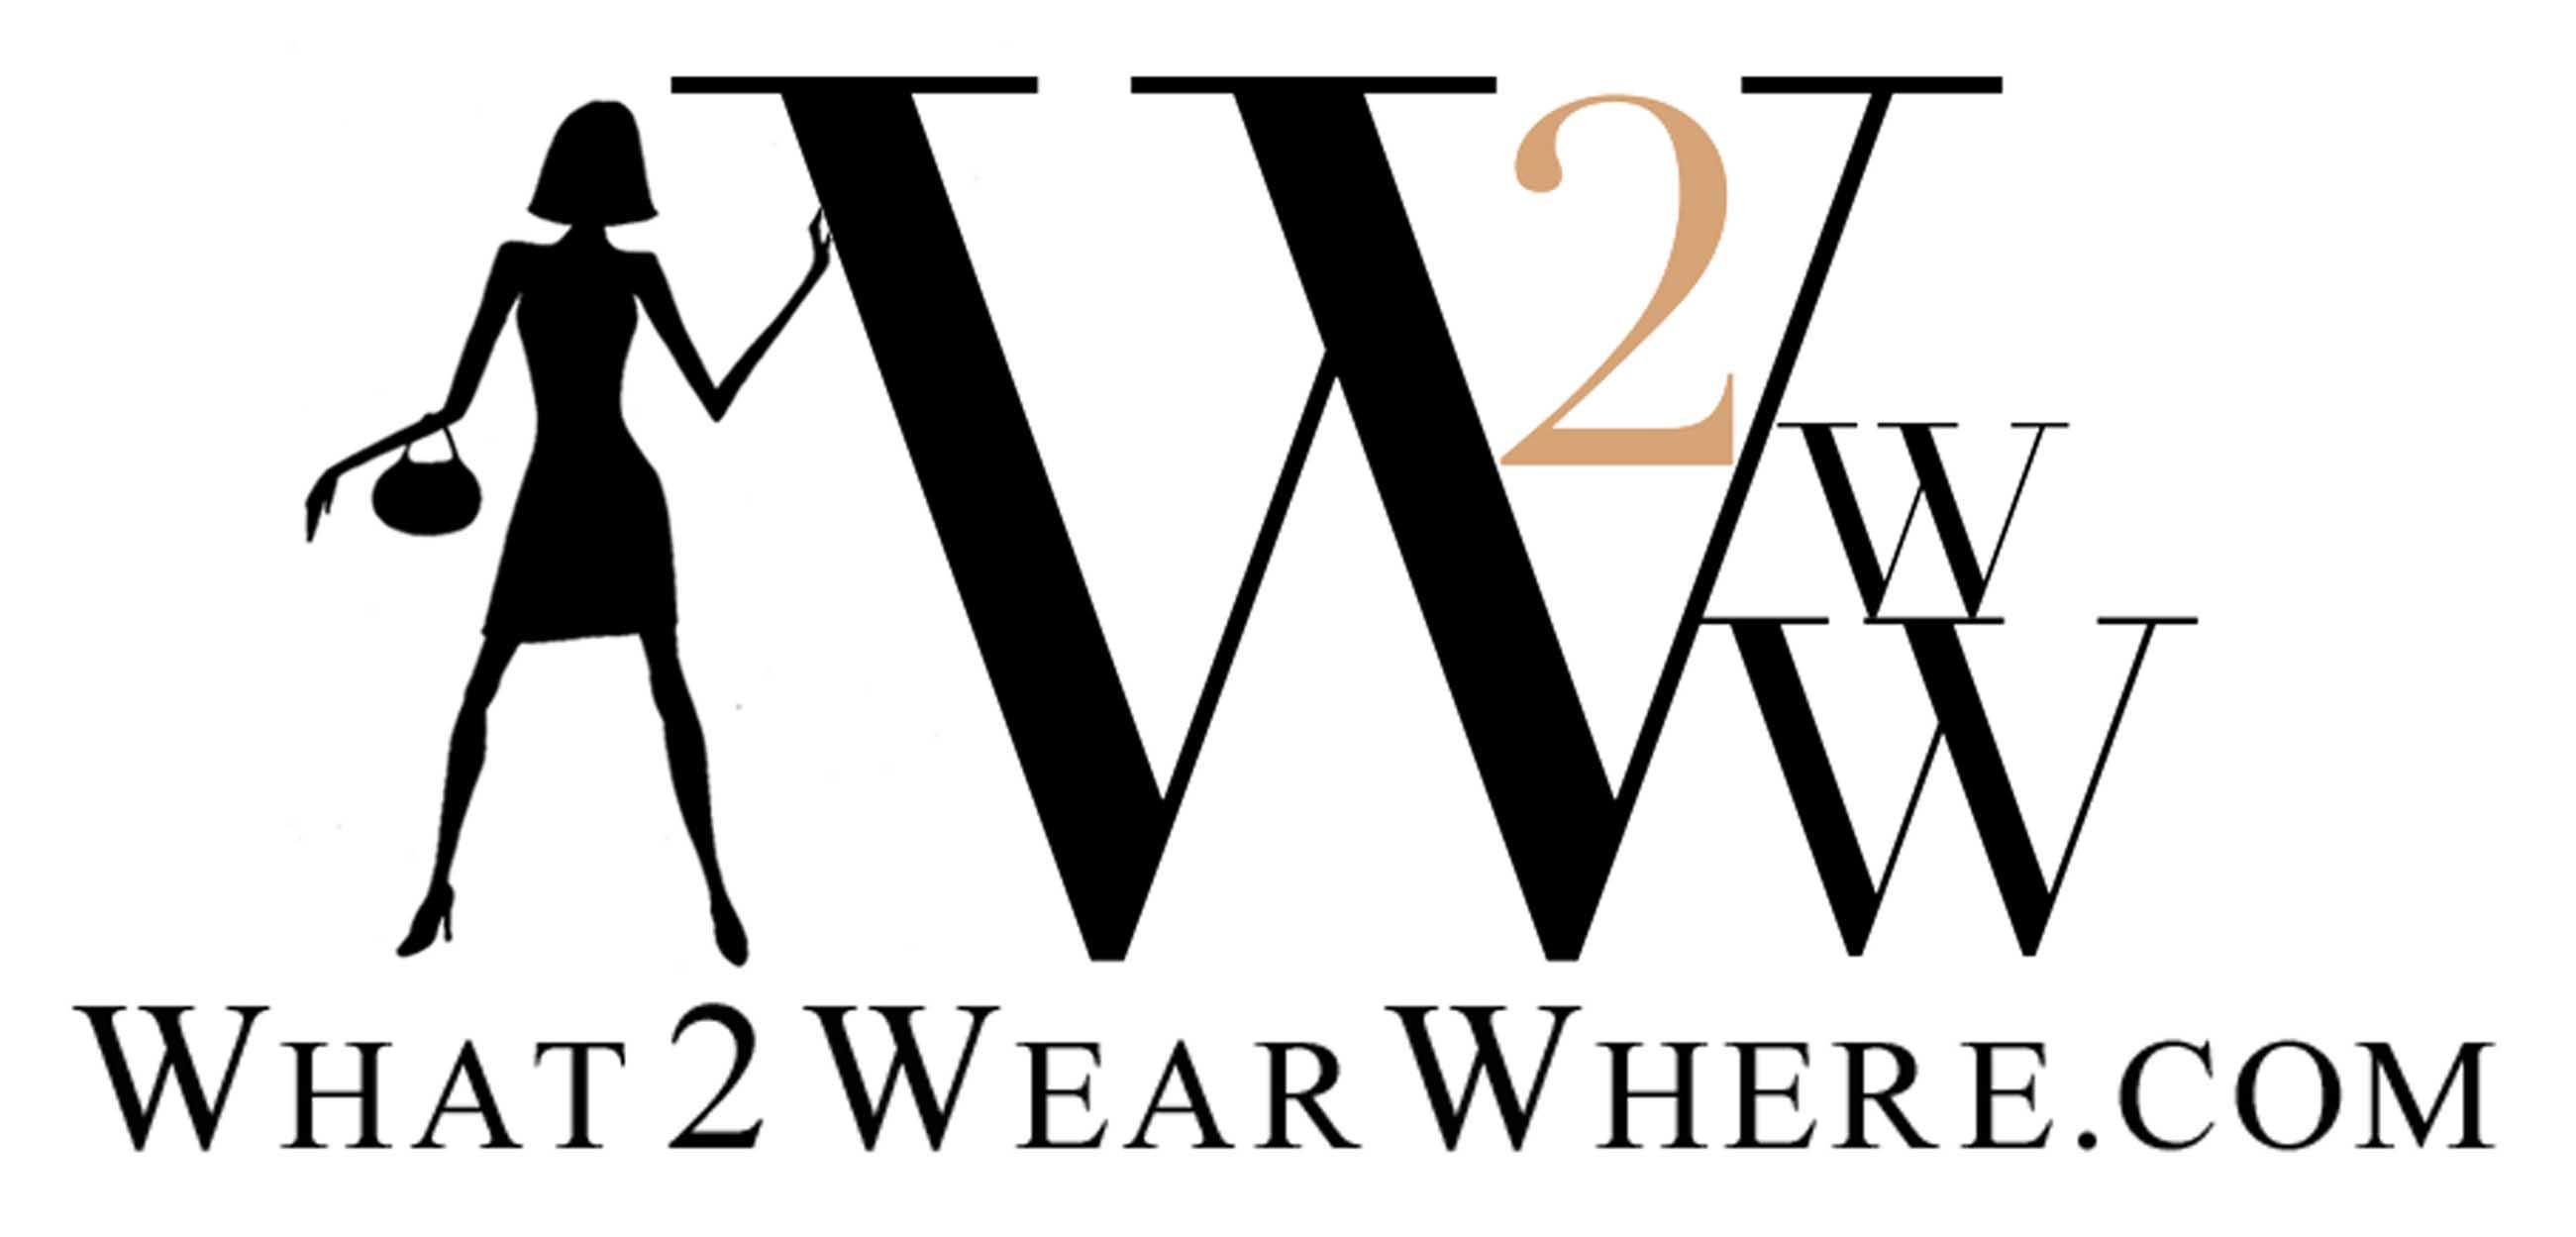 2012-07-26-W2WW_Banner.jpg